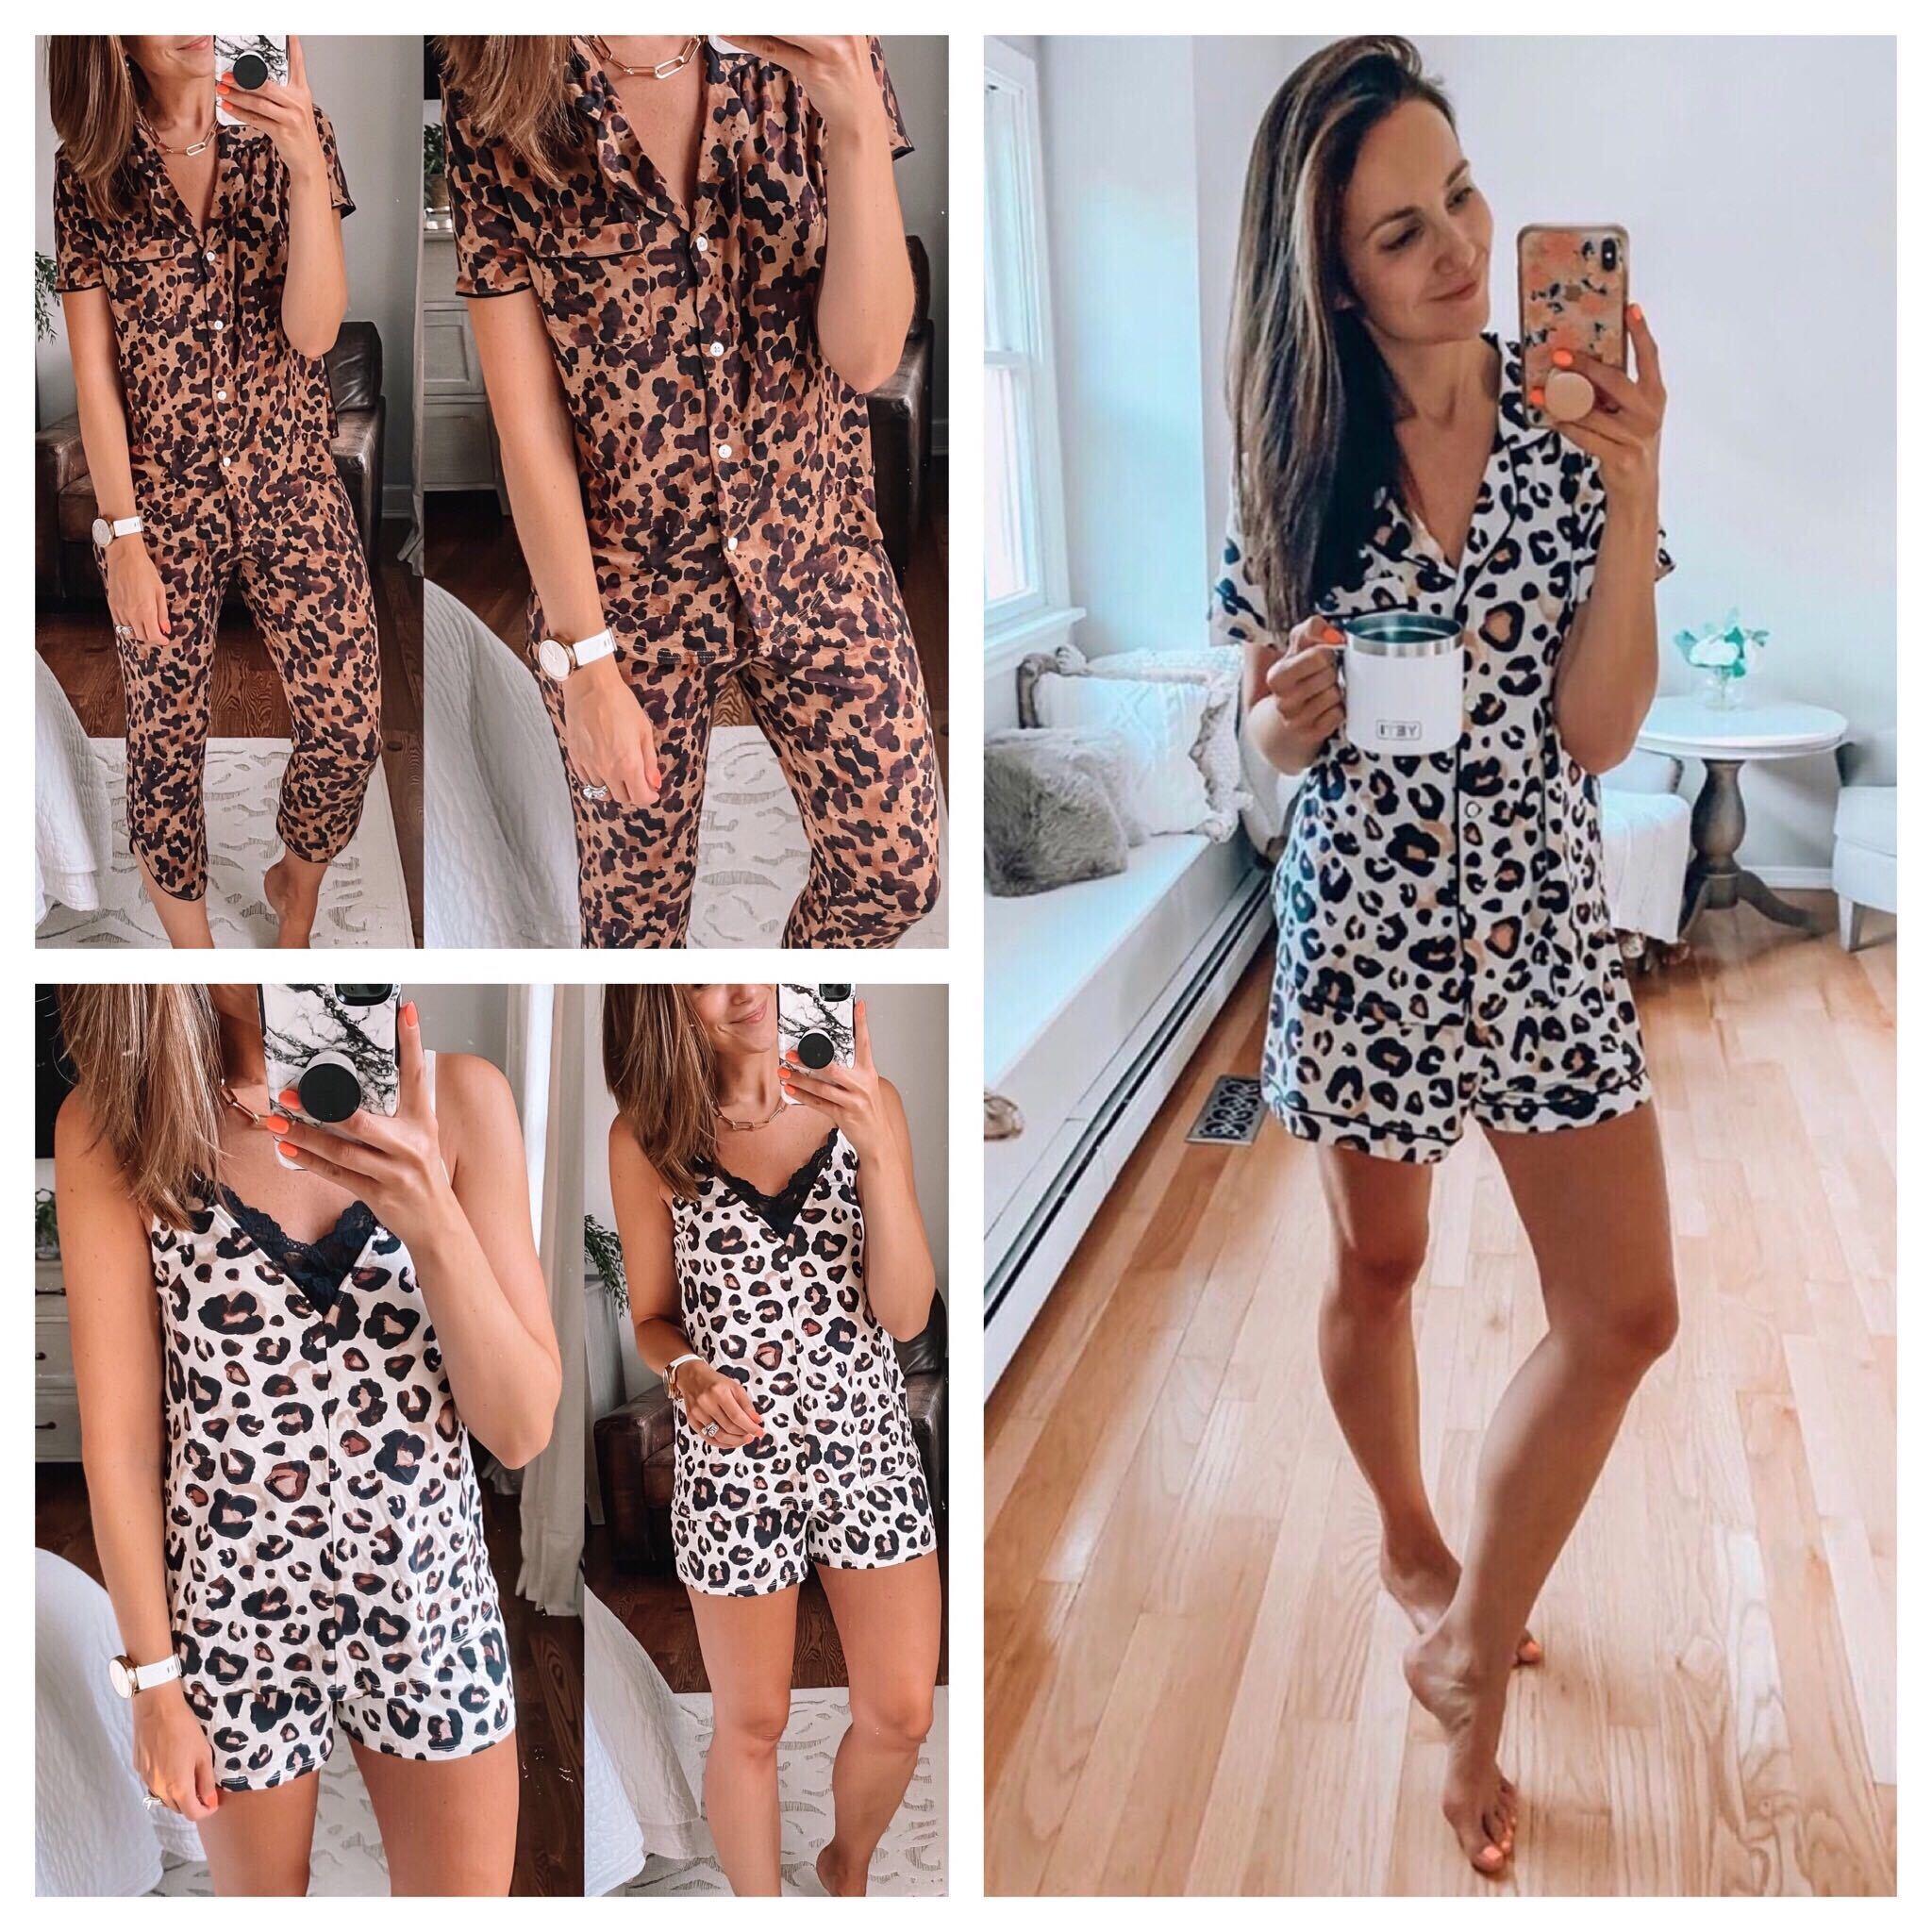 target finds, leopard pajamas